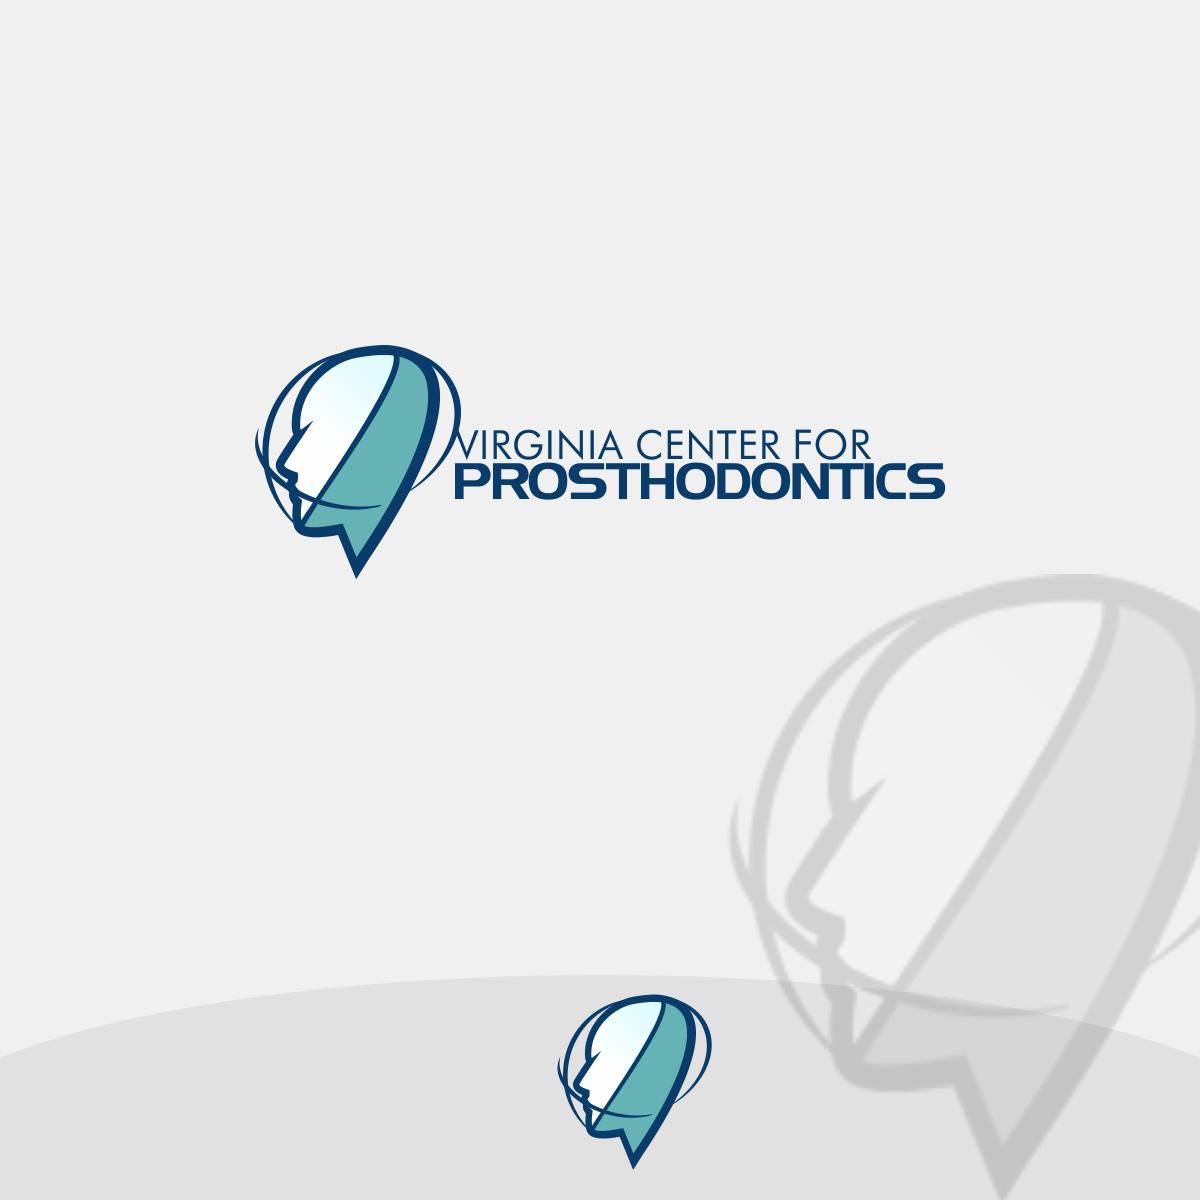 Logo Design by Private User - Entry No. 47 in the Logo Design Contest Imaginative Logo Design for Virginia Center for Prosthodontics.